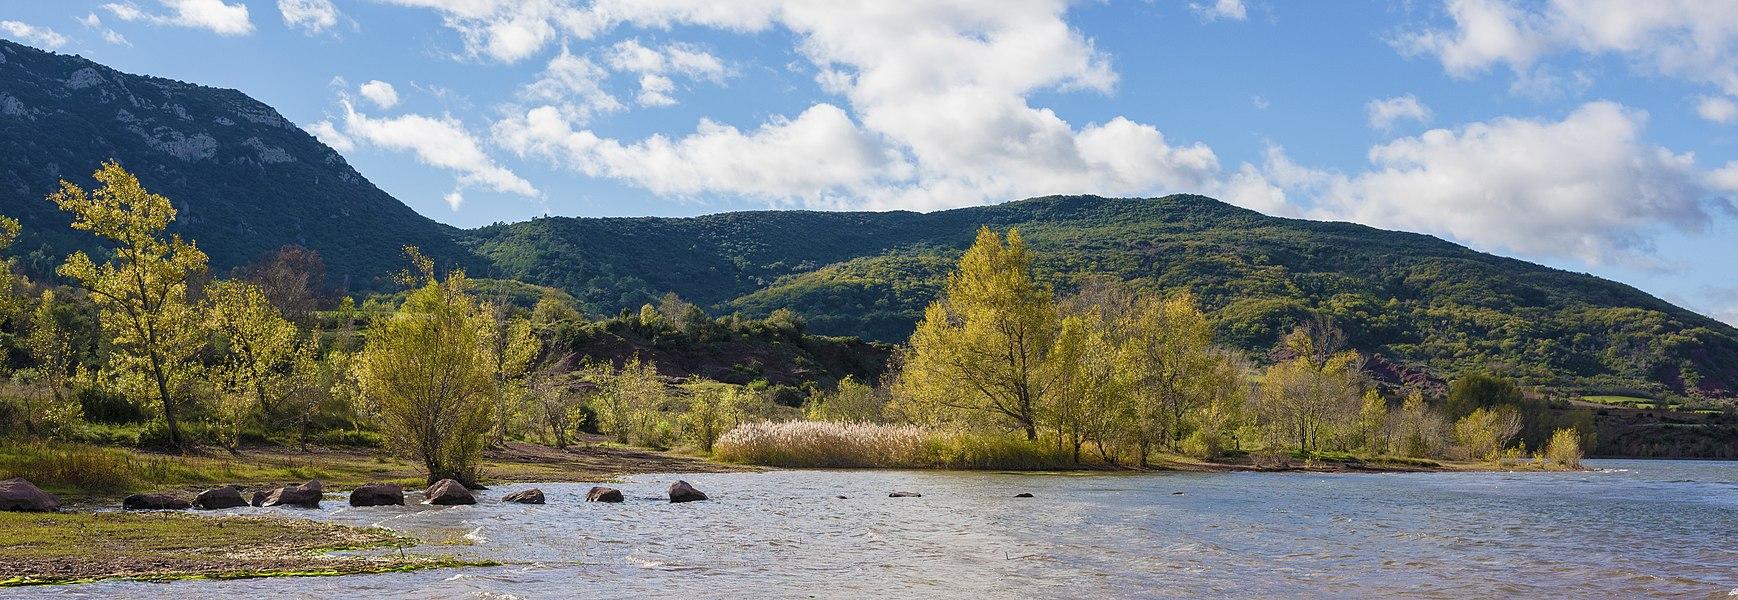 Riverbank of the Salagou Lake. Liausson, Hérault, France.